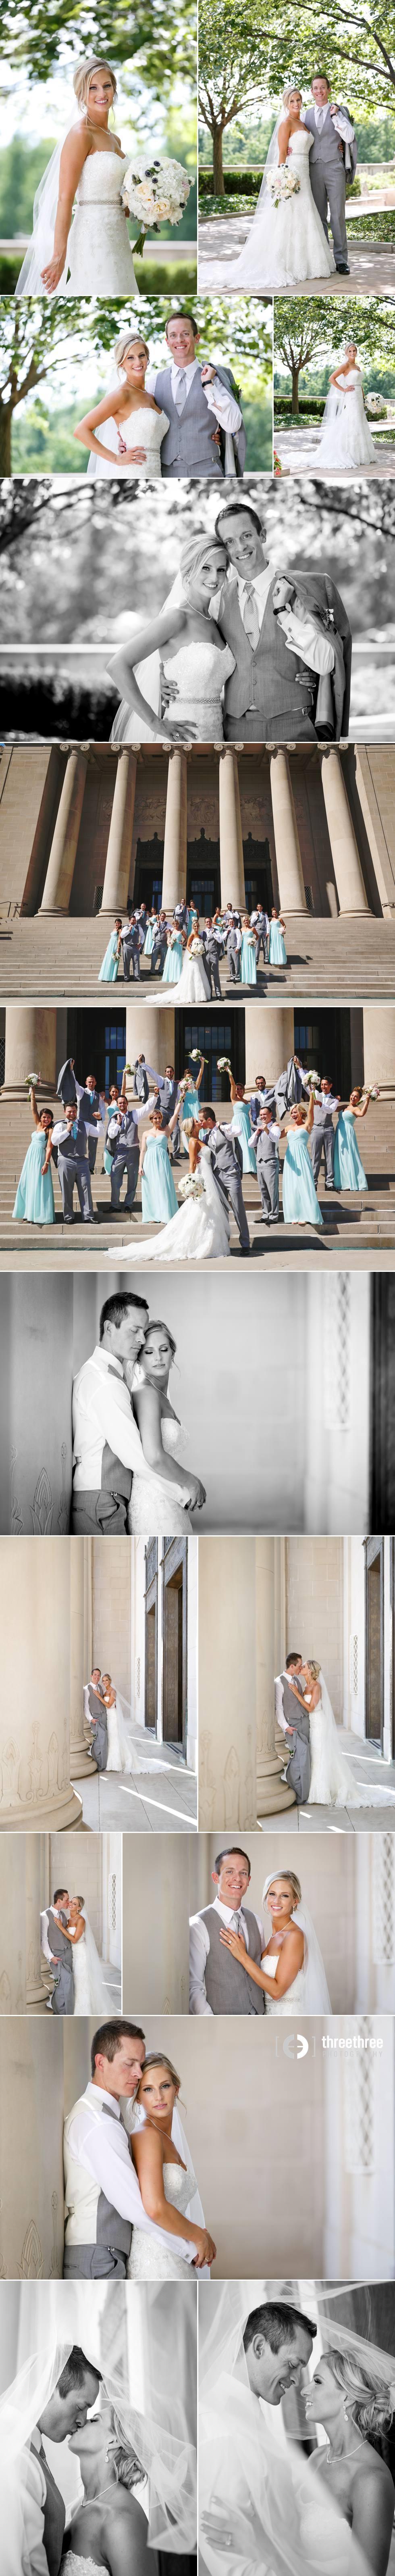 Natalie_AJ_wedding 8